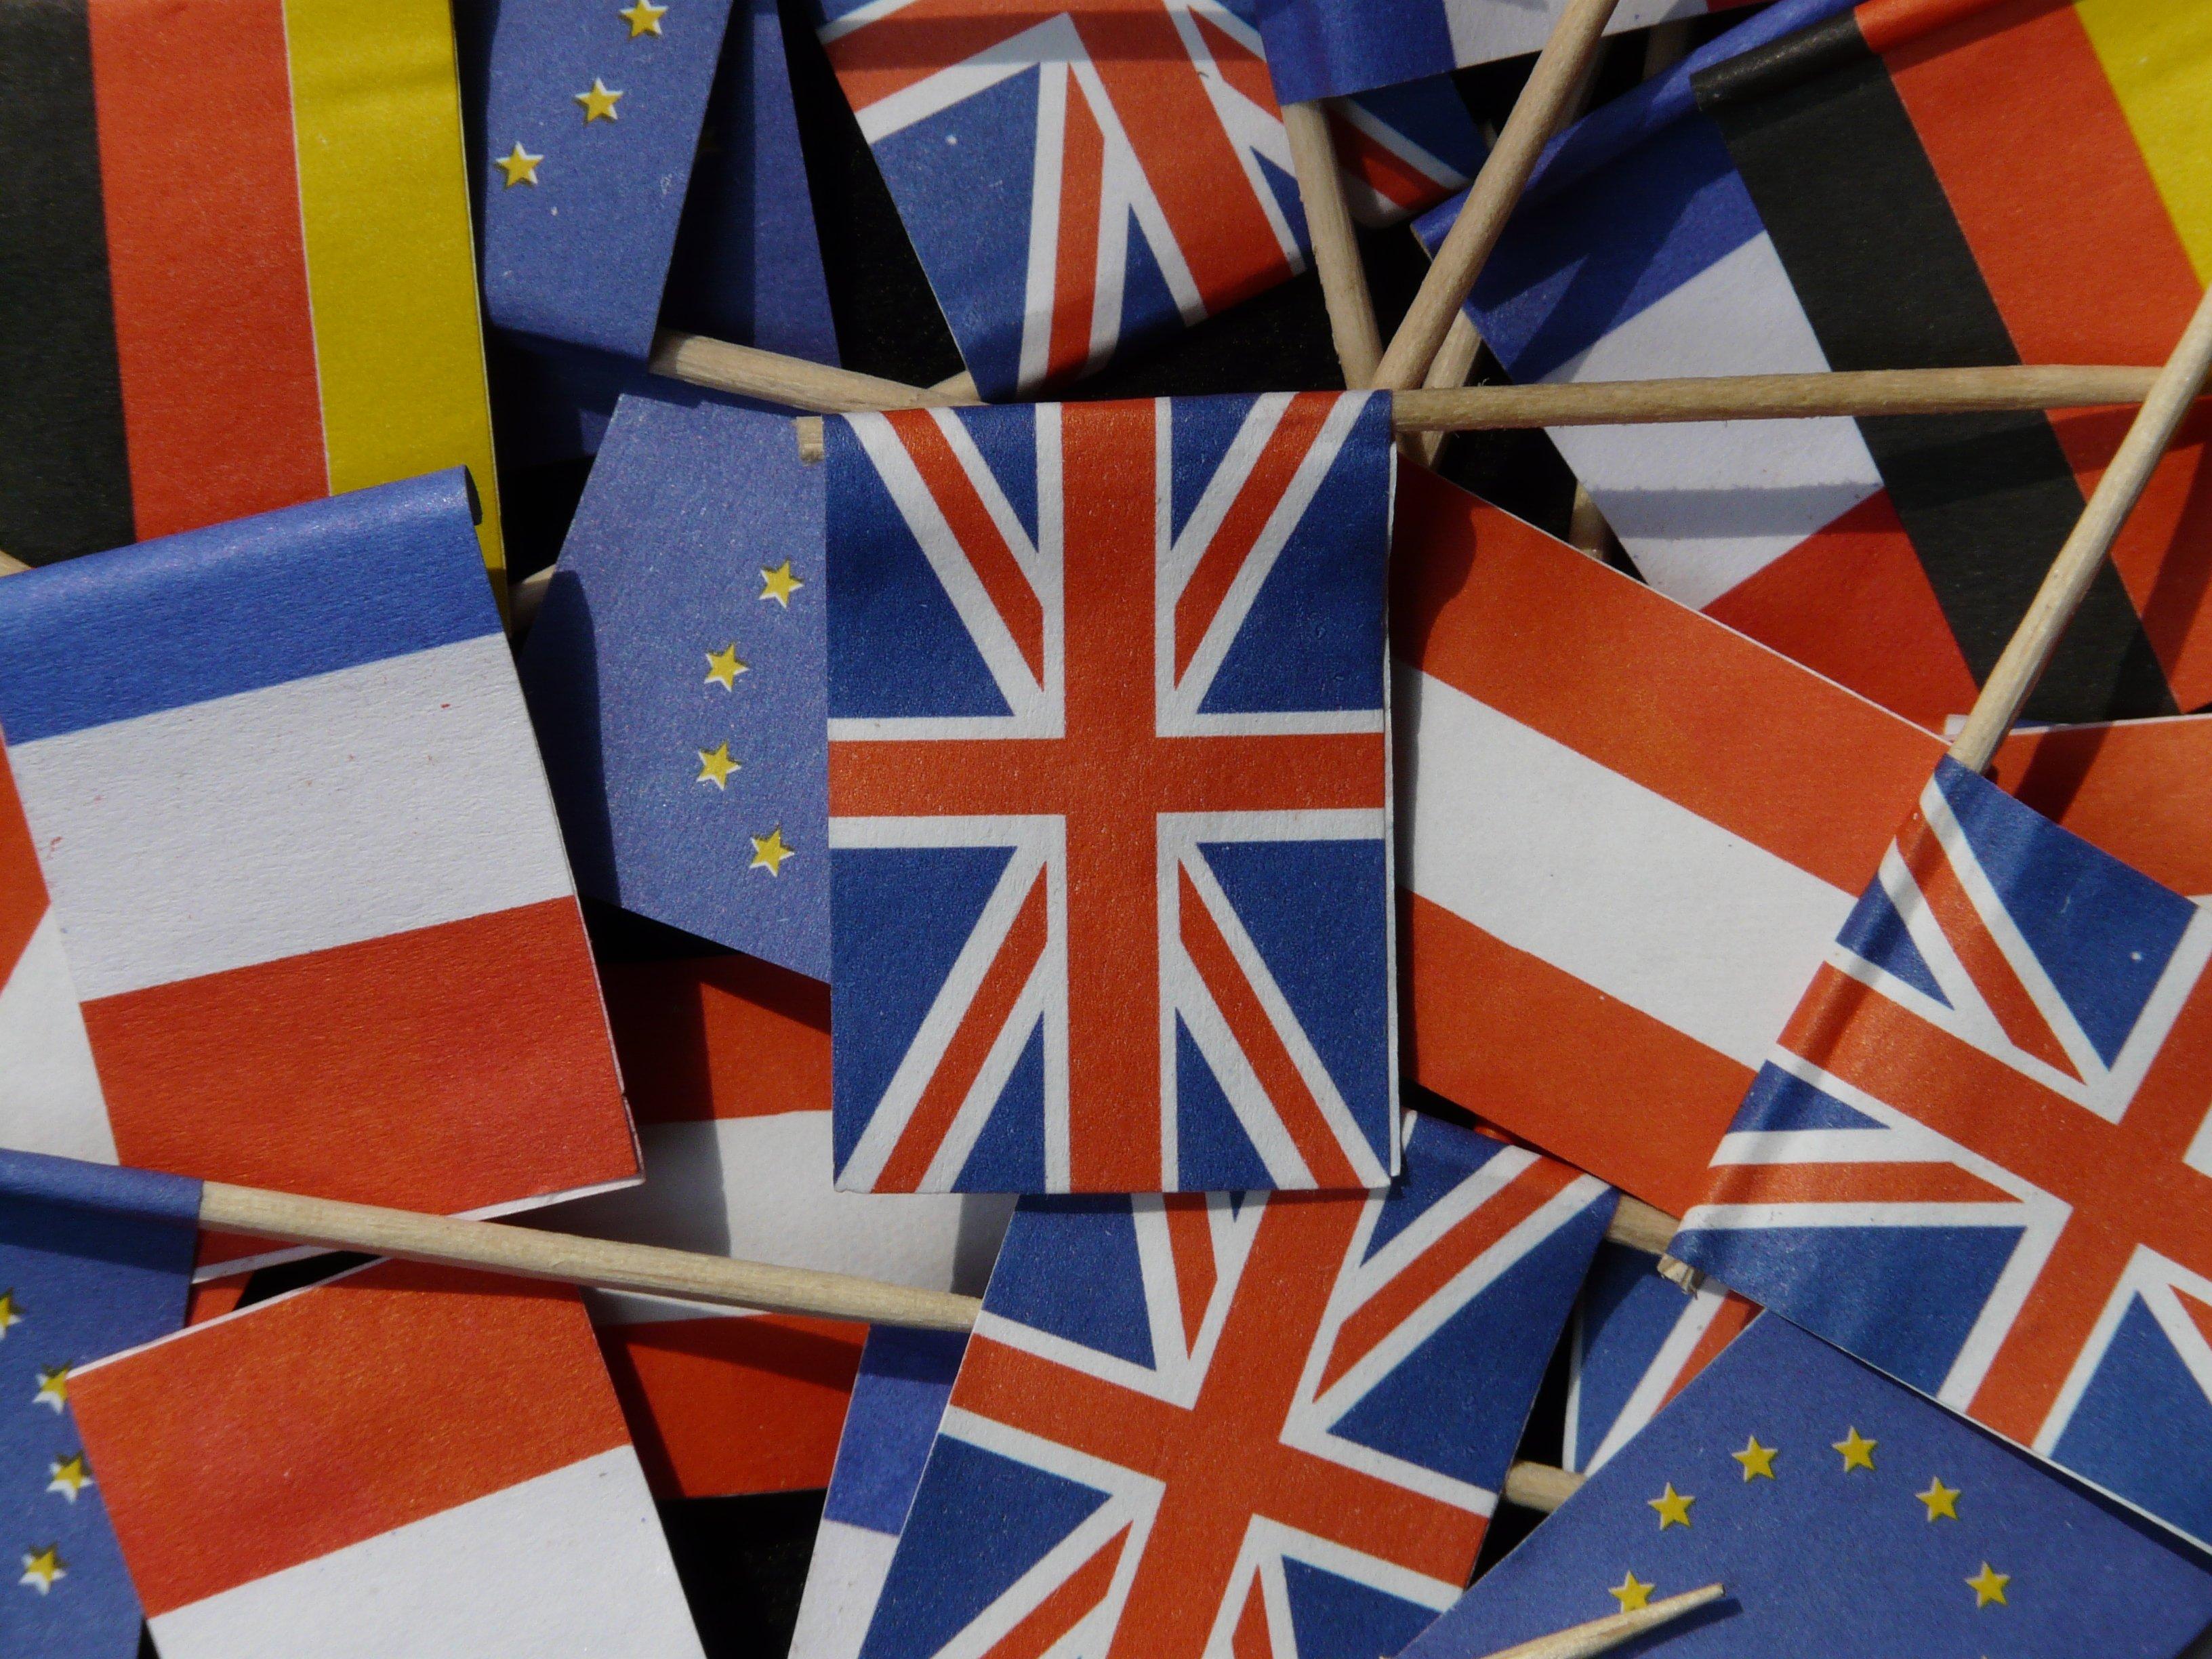 Fotos gratis : país, Francia, Europa, patrón, color, bandera, azul ...